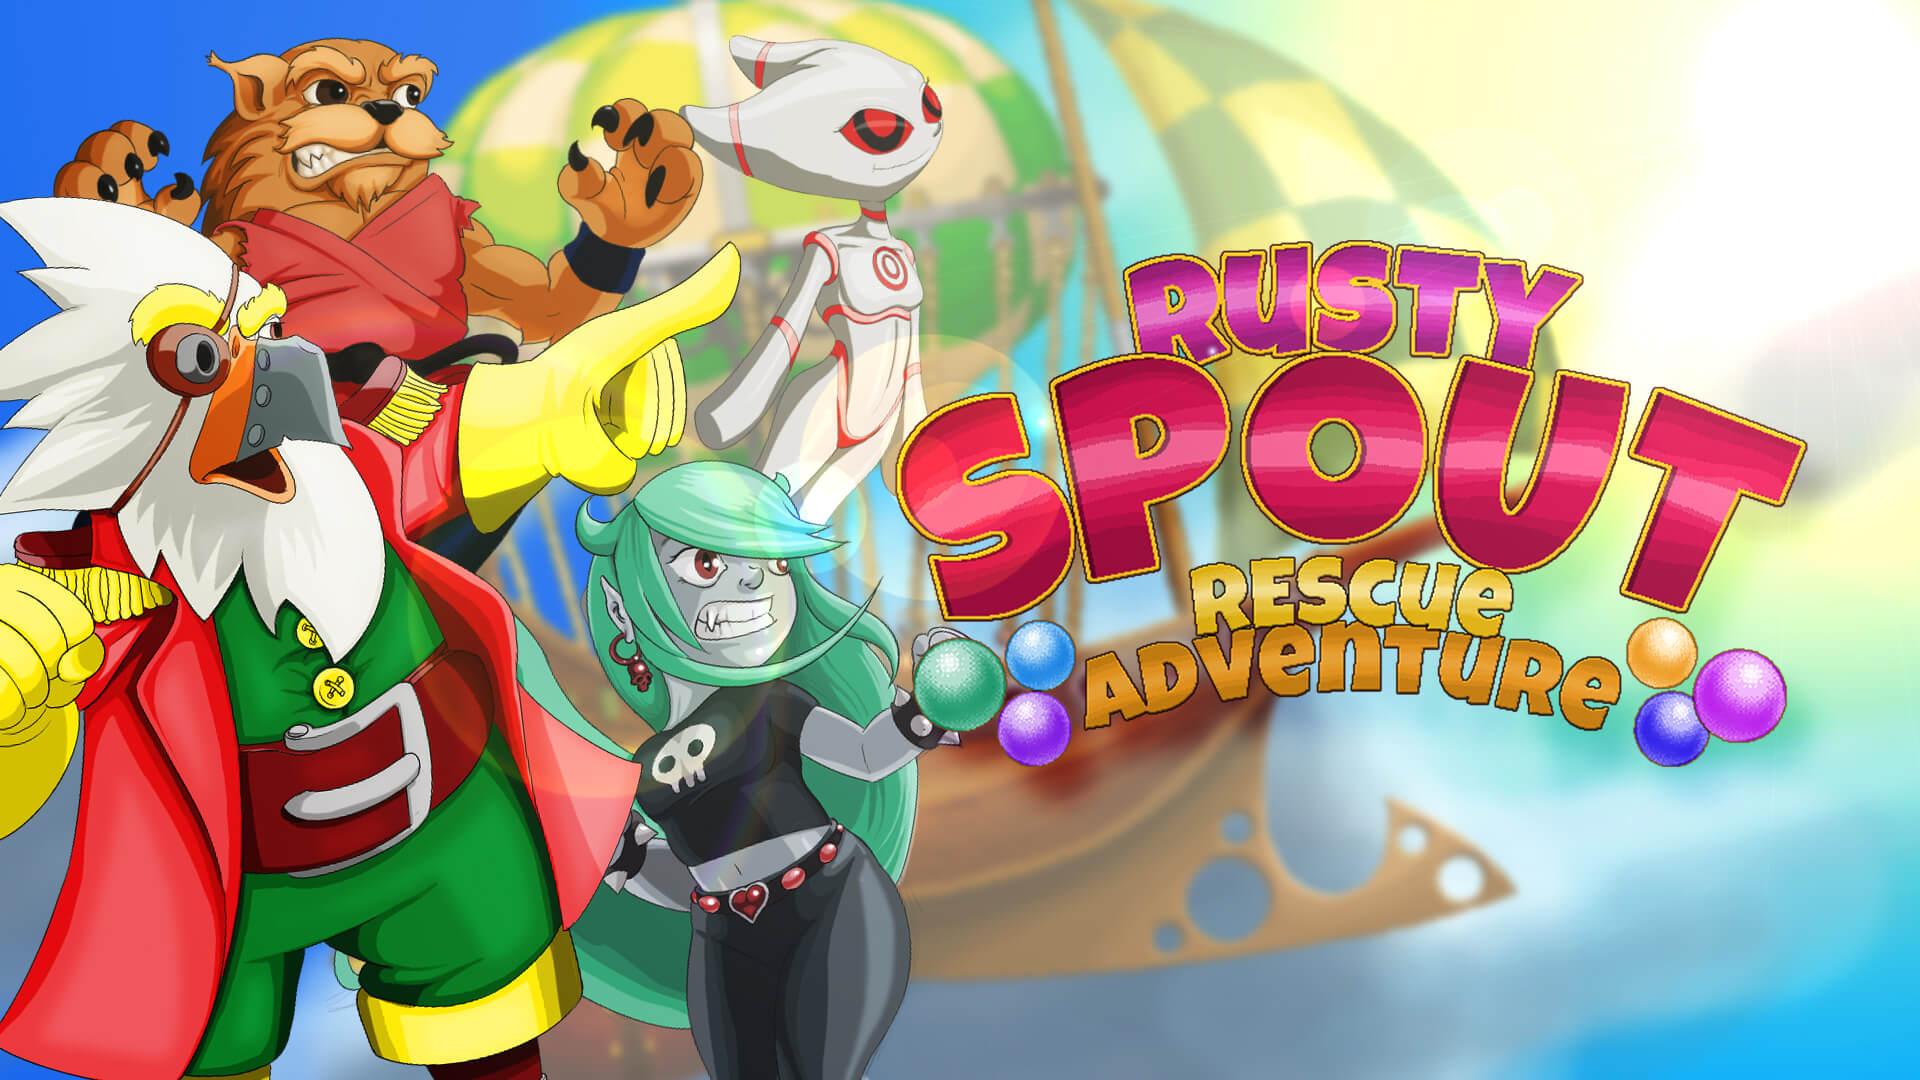 Rusty Spout Rescue Adventure Free PC Download